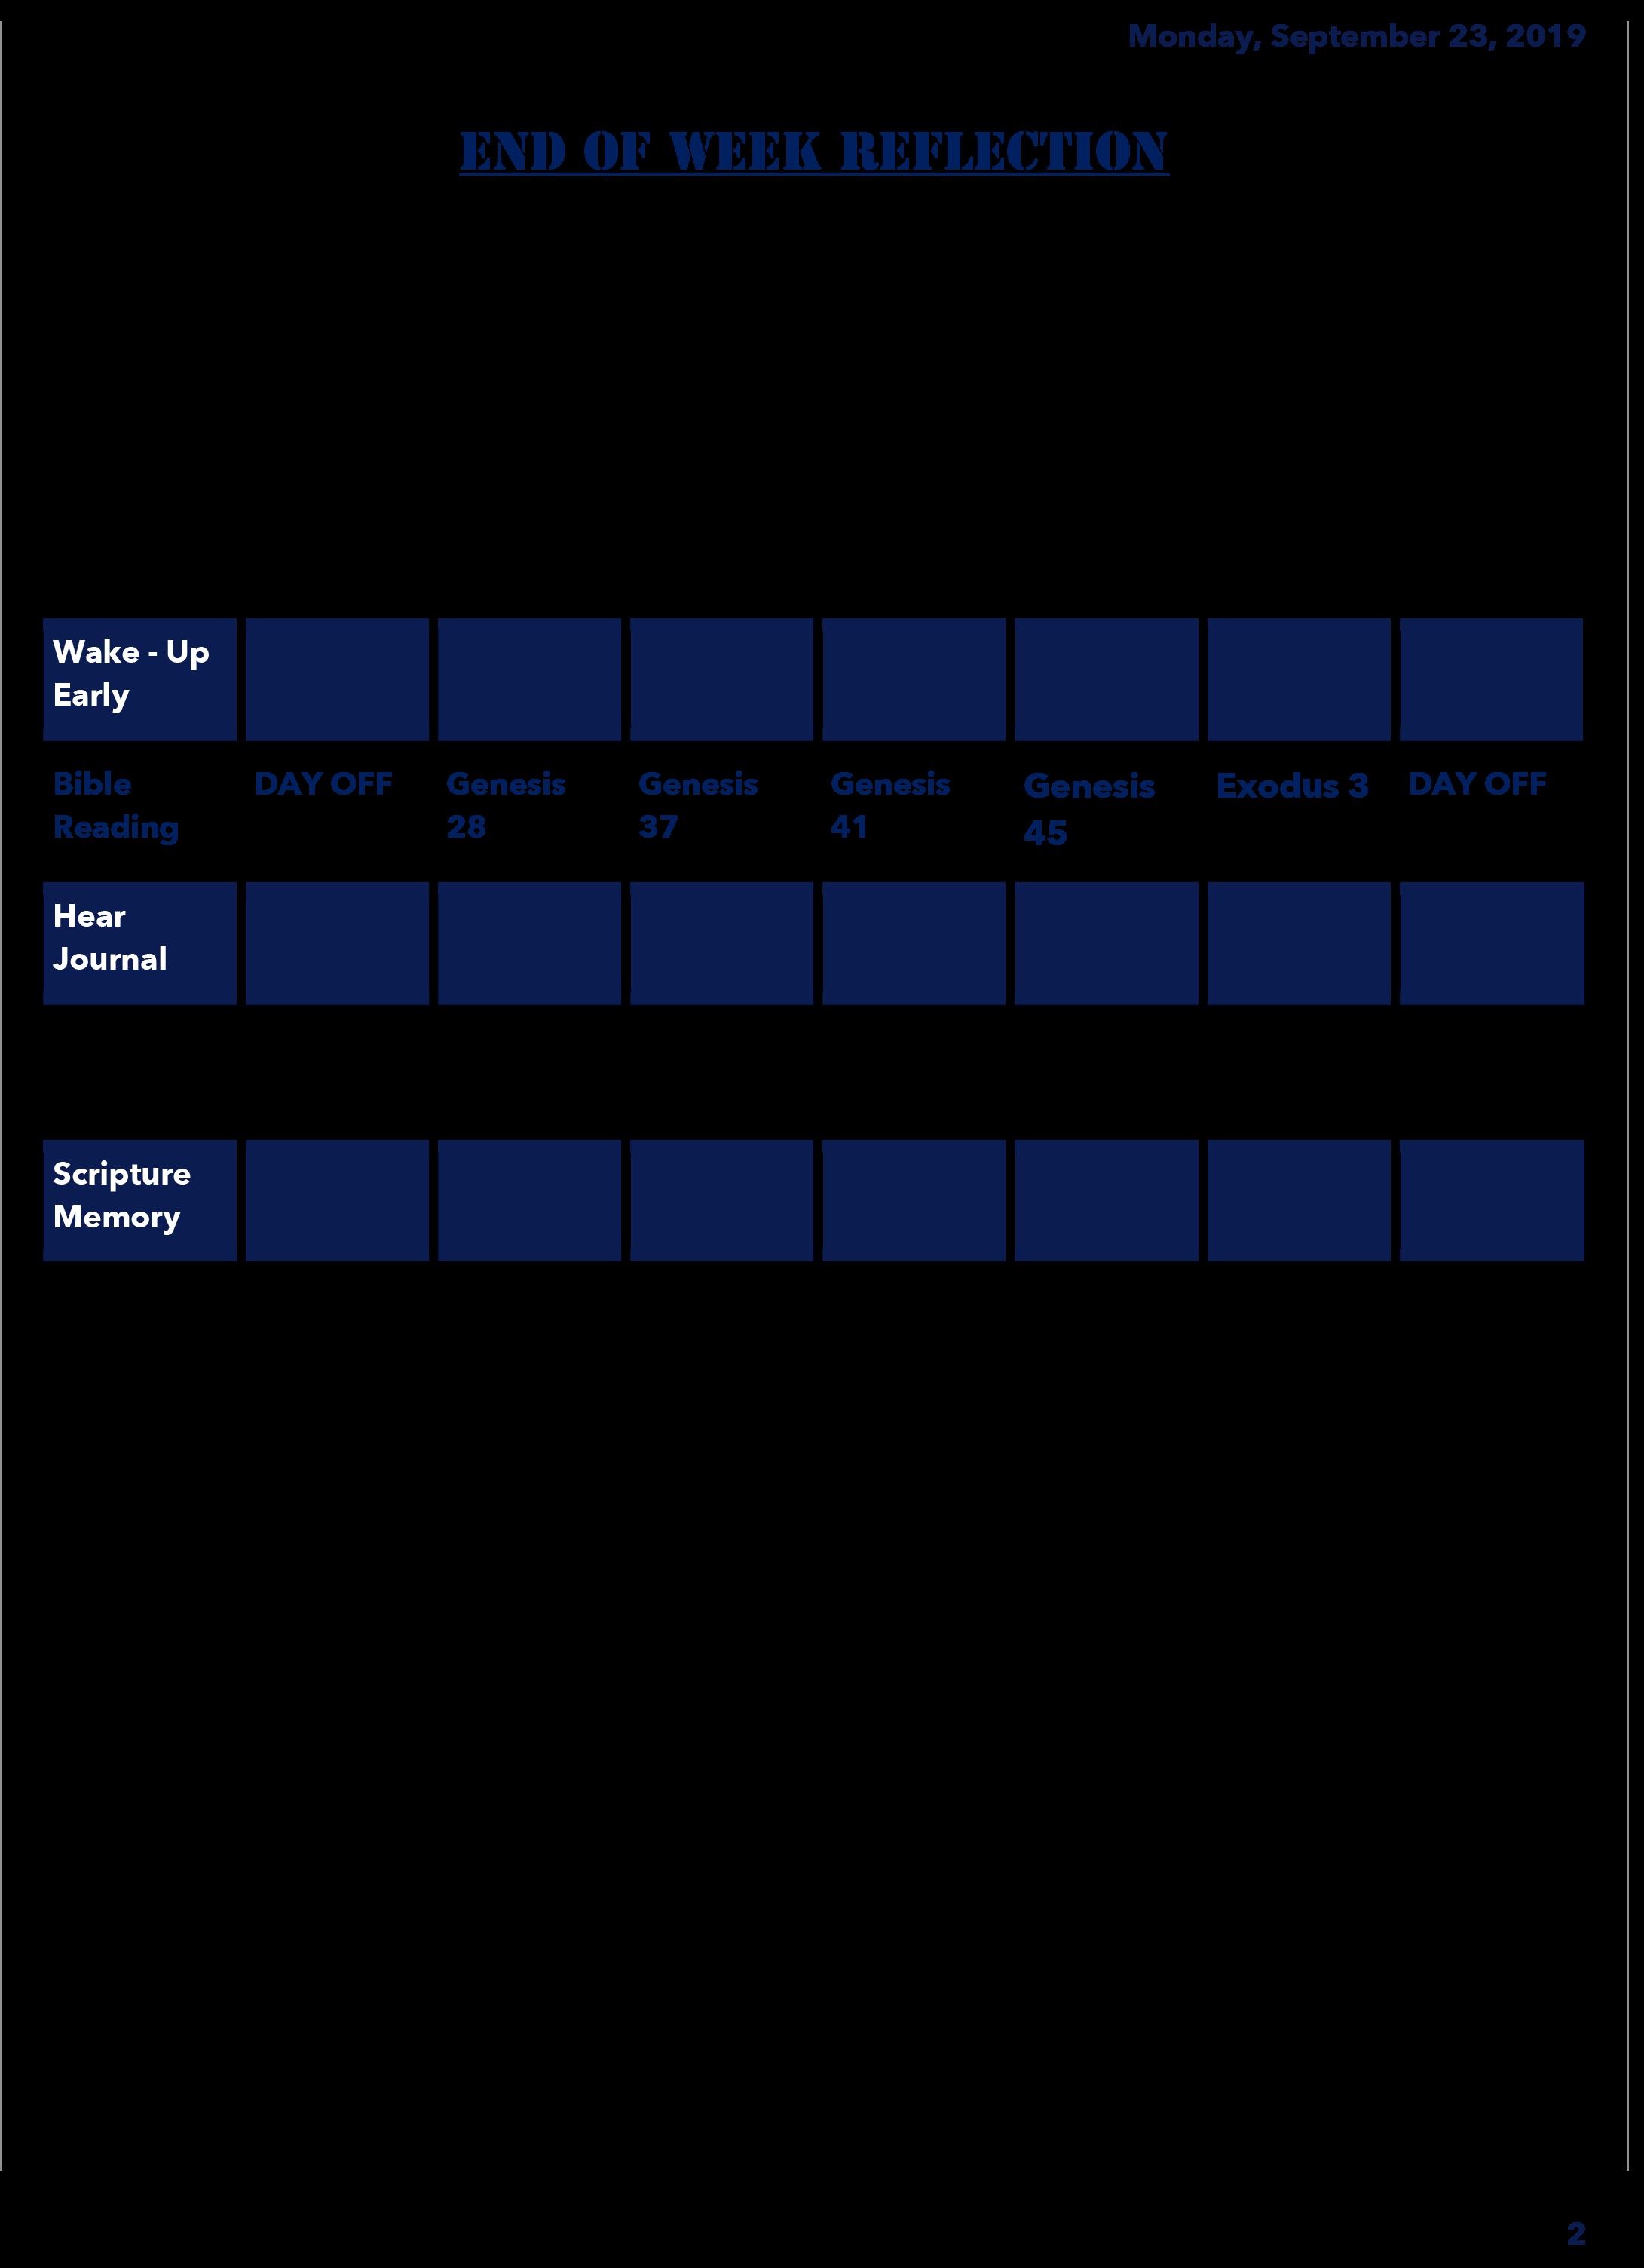 Battle Plan (9.23.19)-2.png